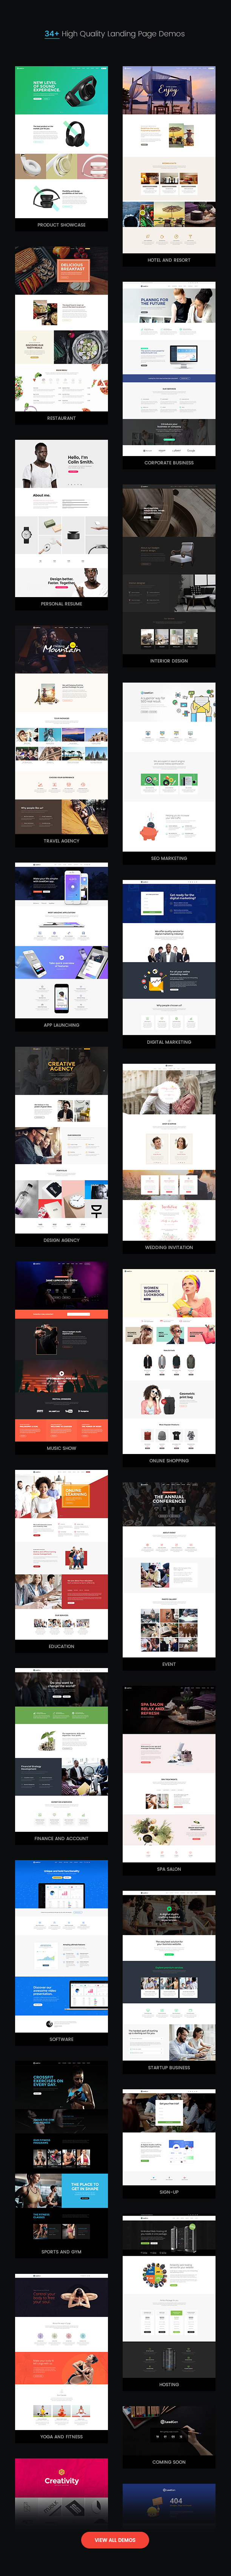 LeadGen - Multipurpose Marketing Landing Page Pack with HTML Builder - 9